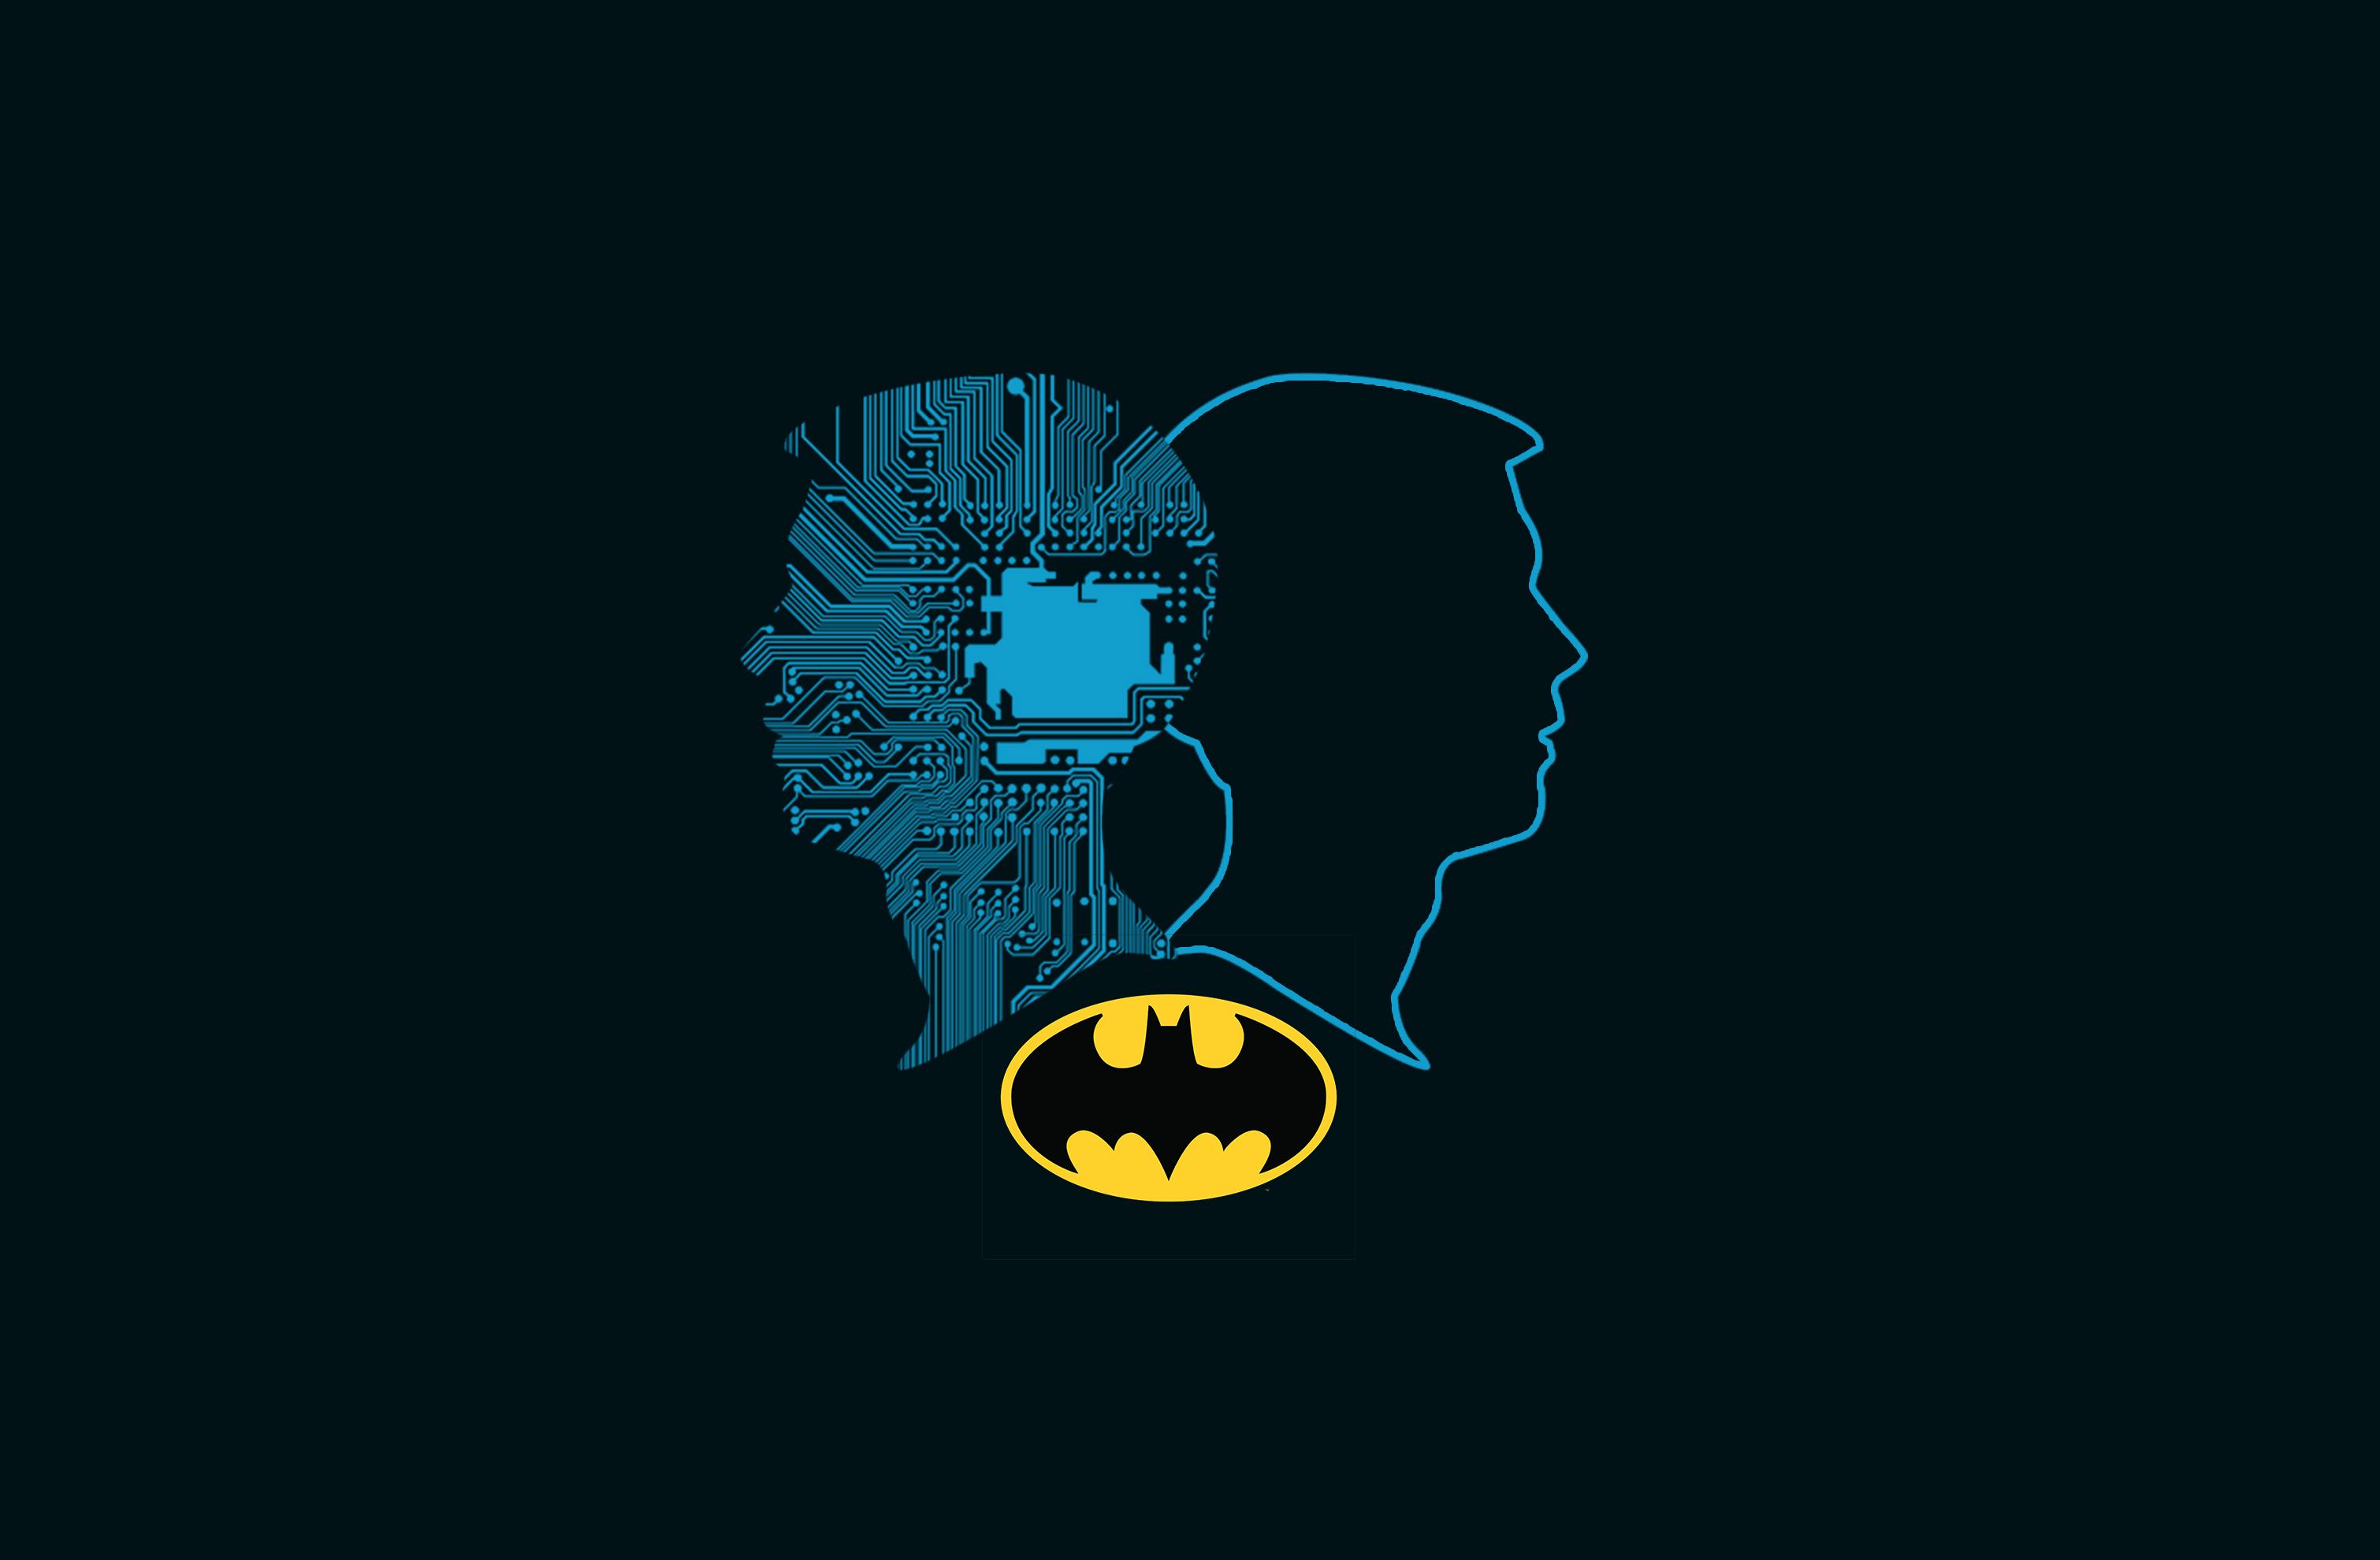 Batman Movie Script Written By AI After Watching 1000 Hours